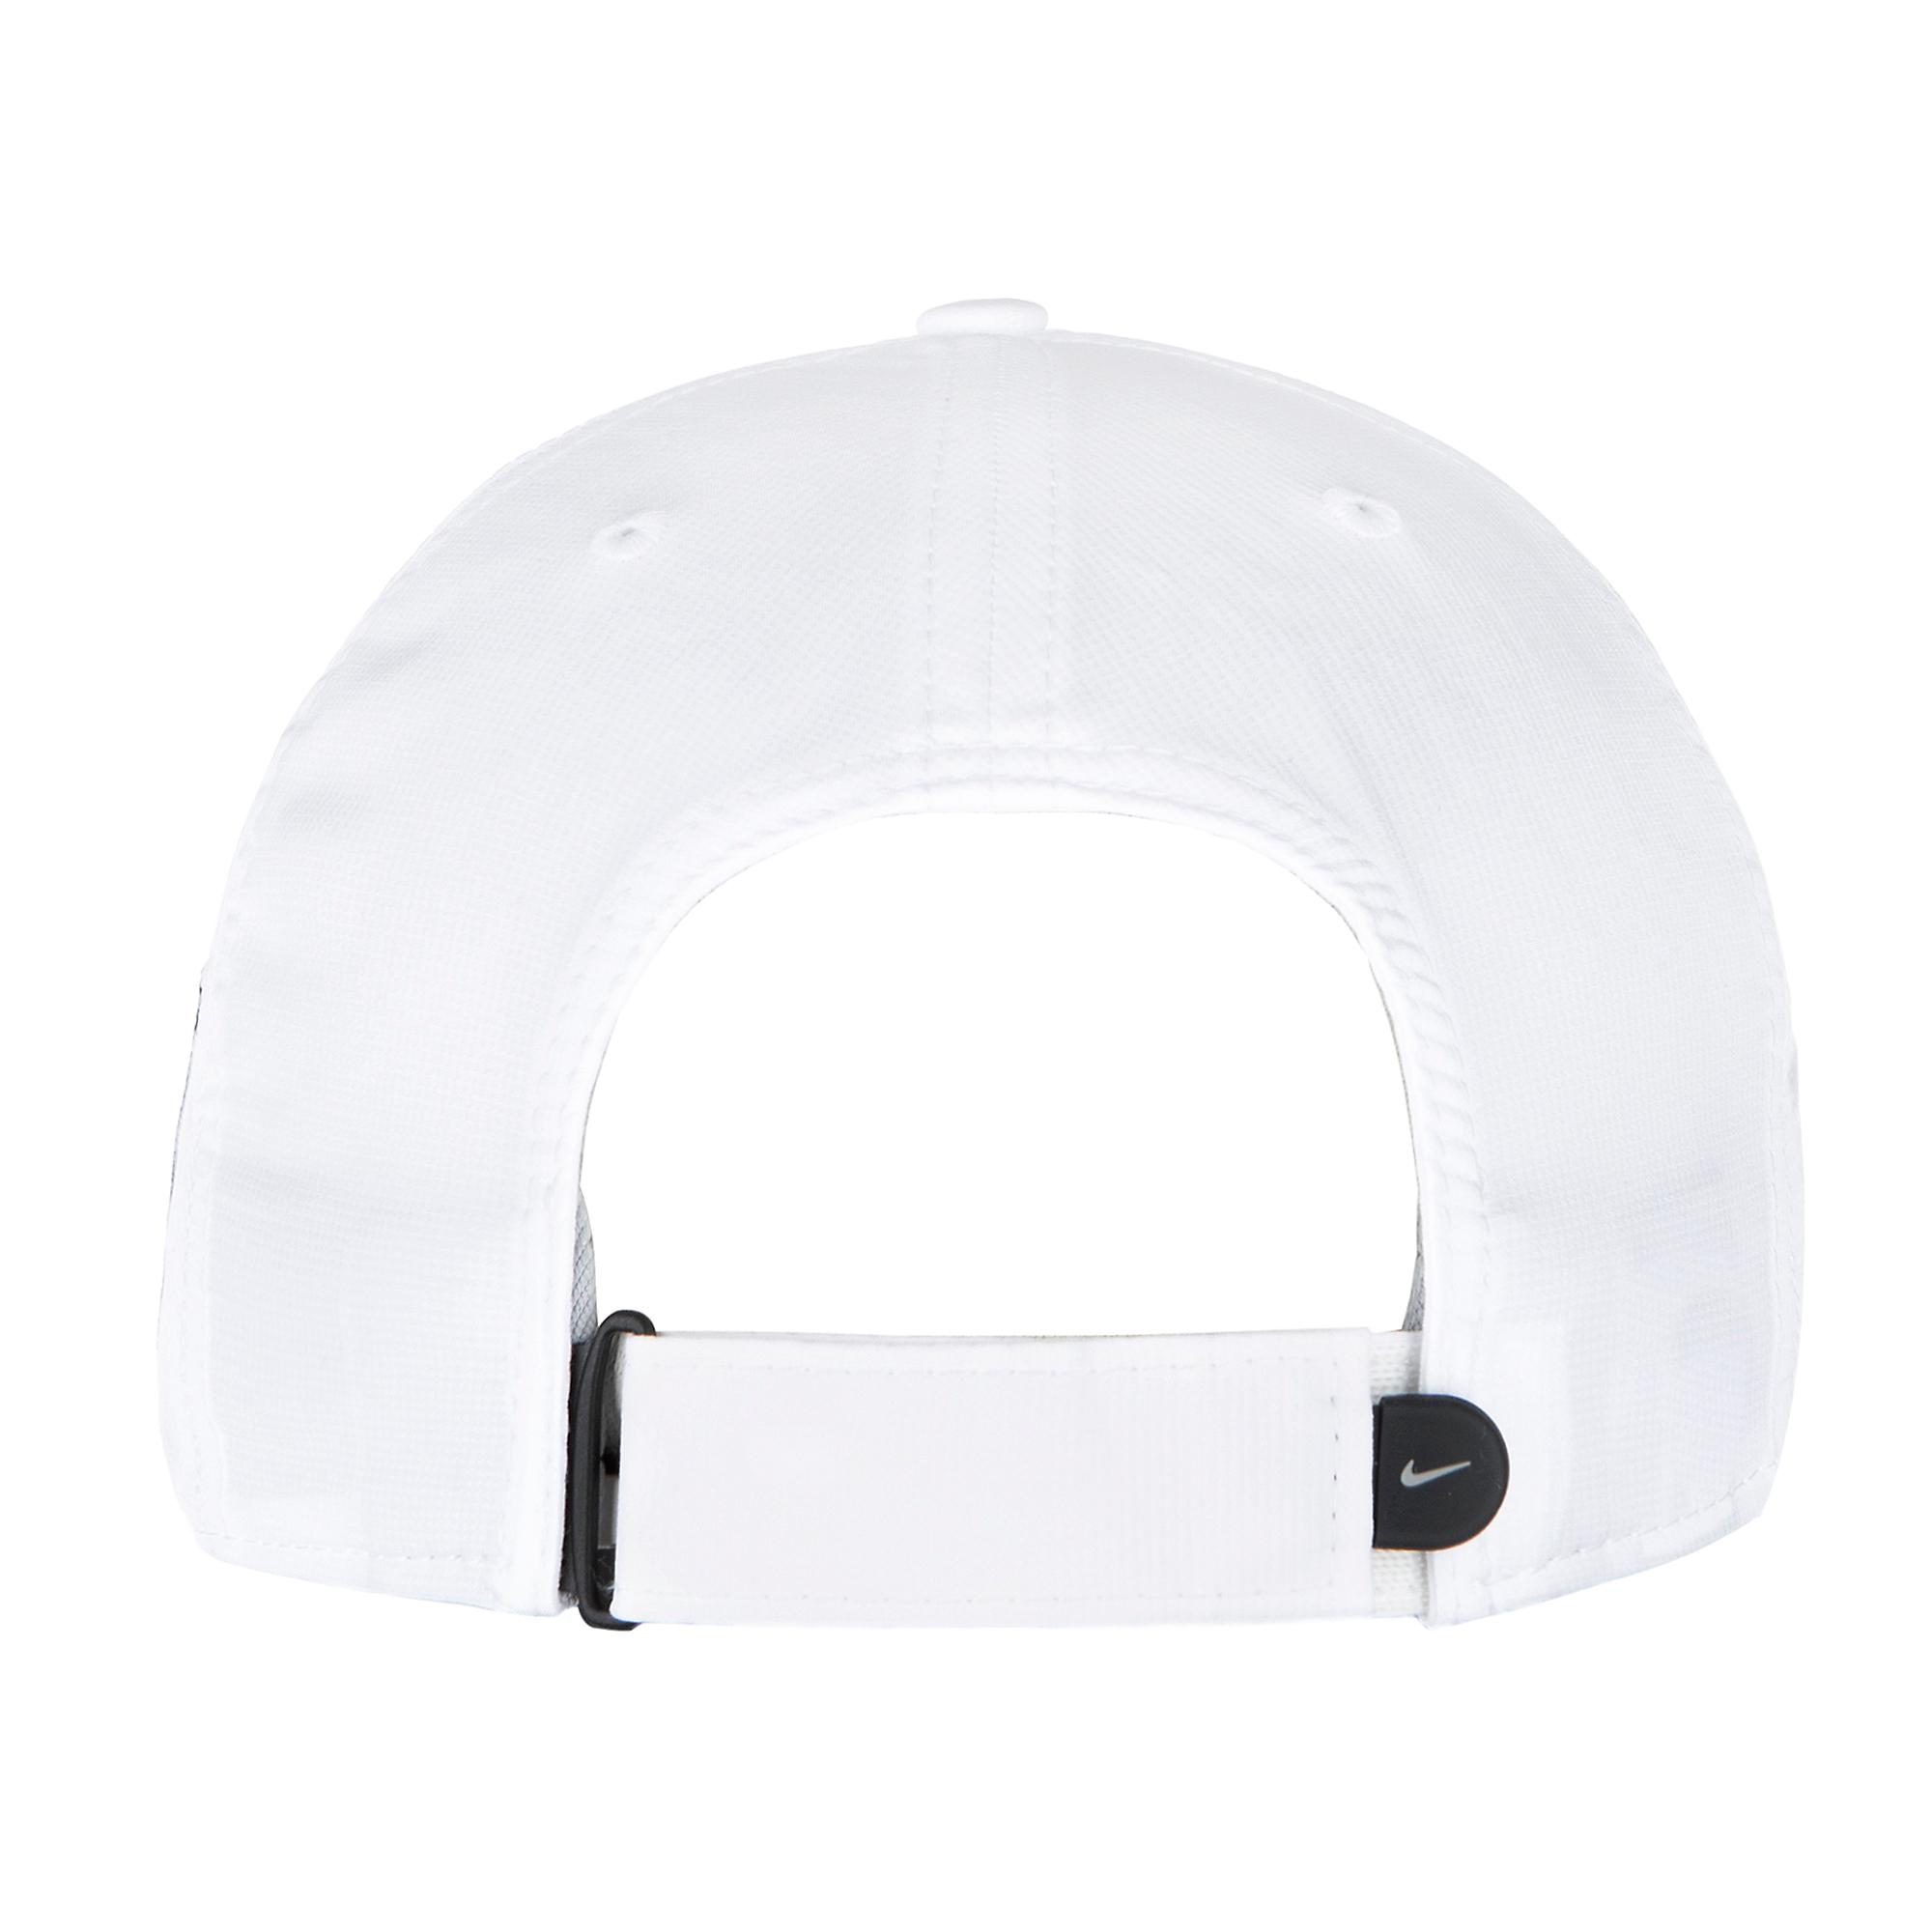 06d9b98ca Dallas Cowboys Nike Youth White Golf Cap | Dallas Cowboys Pro Shop